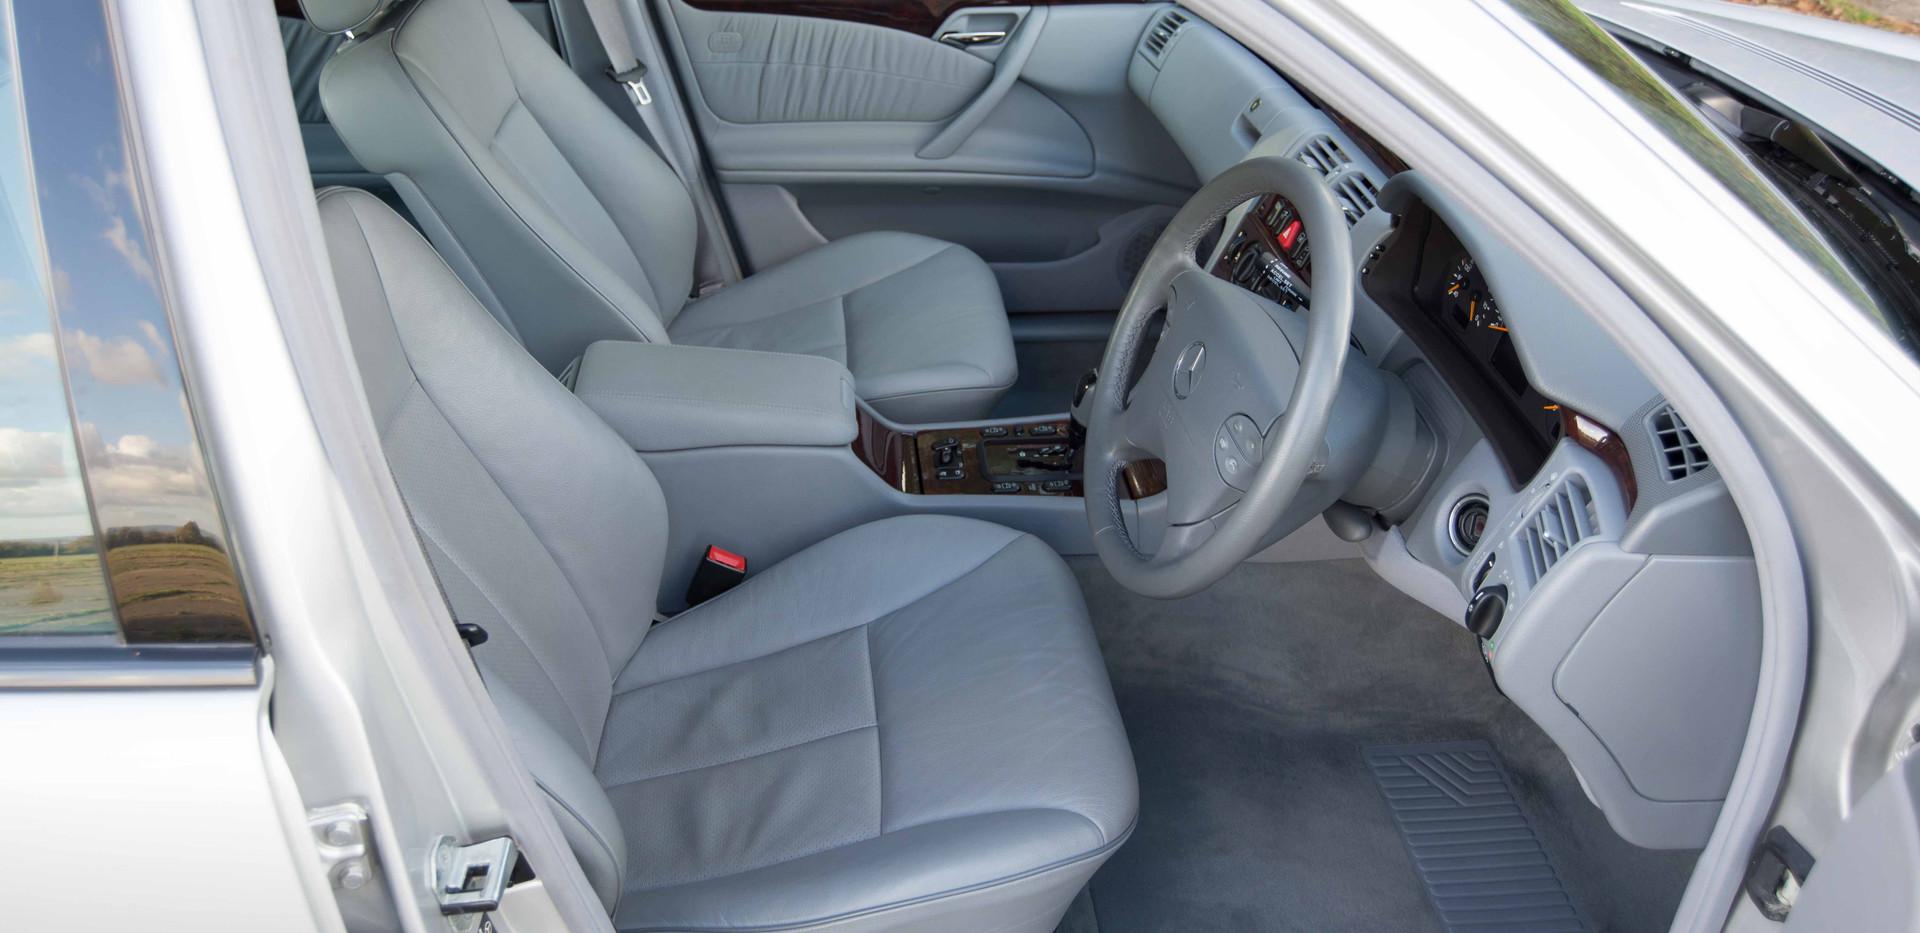 Mercedes E240 For Sale UK London  (55 of